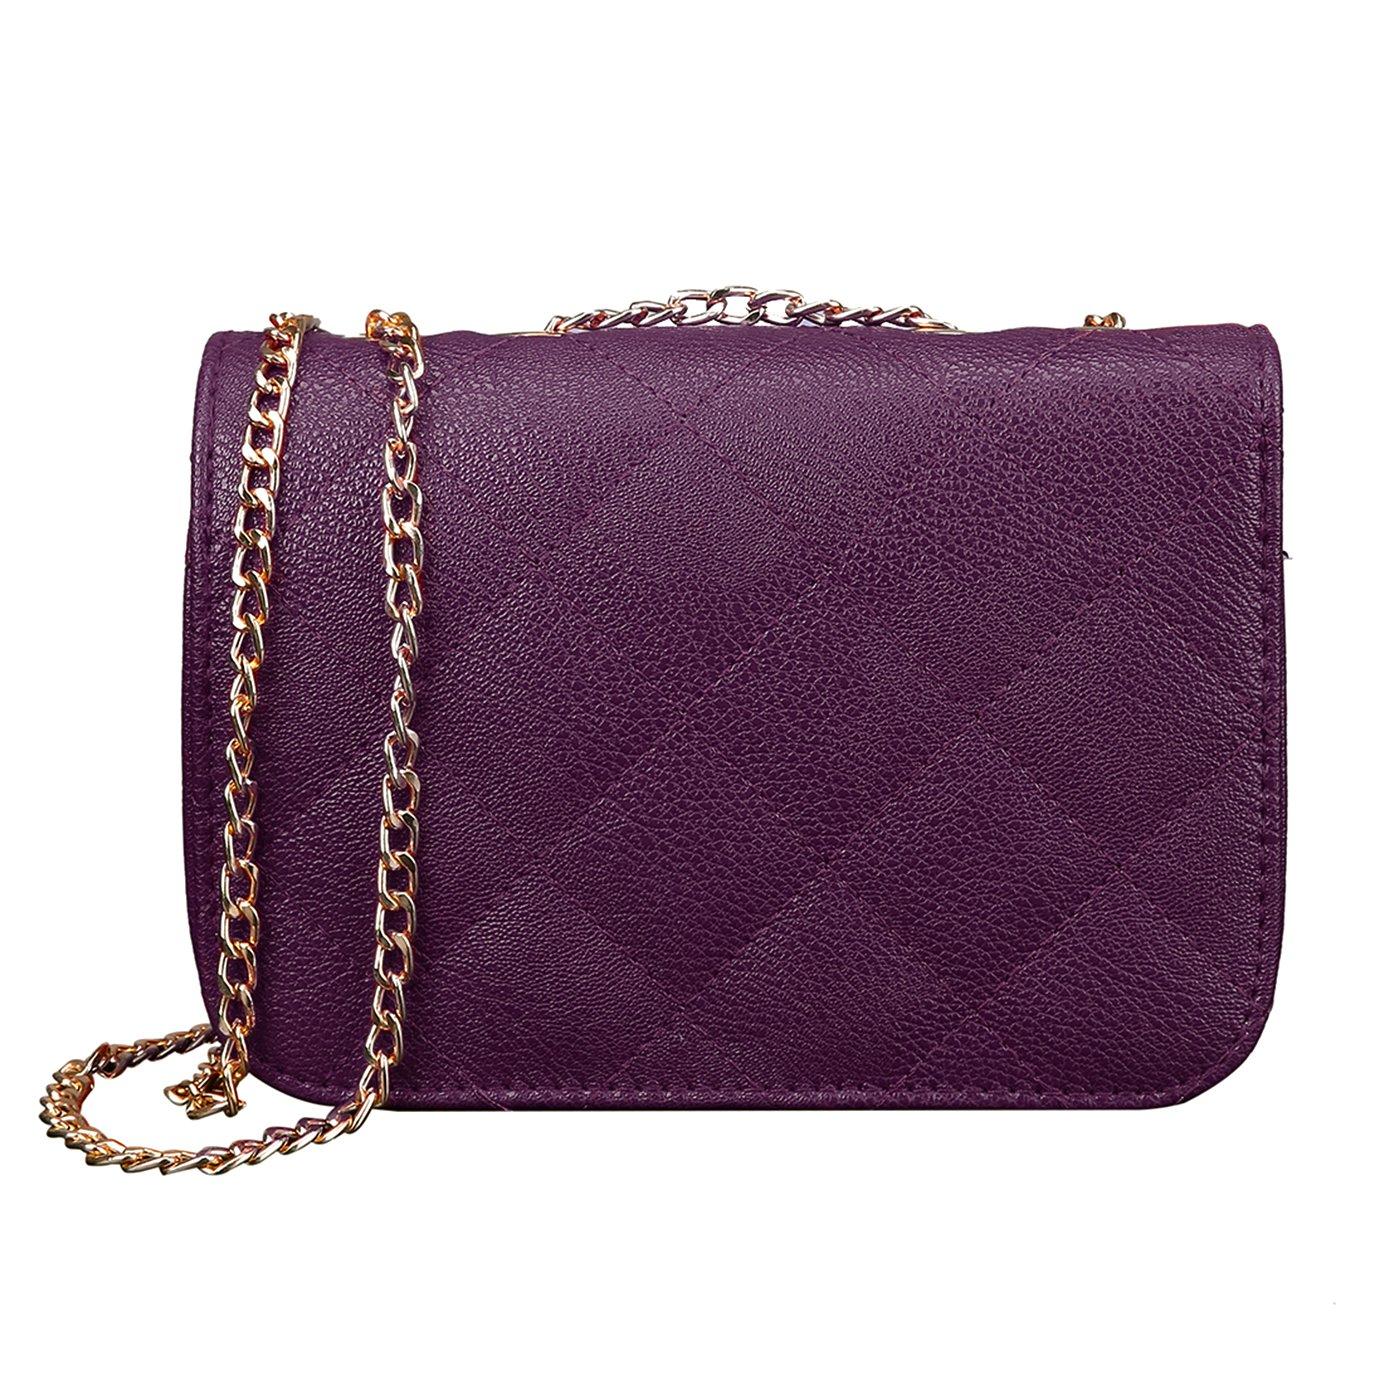 b8acd05e5cb HDE Women s Small Crossbody Handbag Purse Bag with Chain Shoulder Strap ( Dark Purple)  Amazon.in  Shoes   Handbags